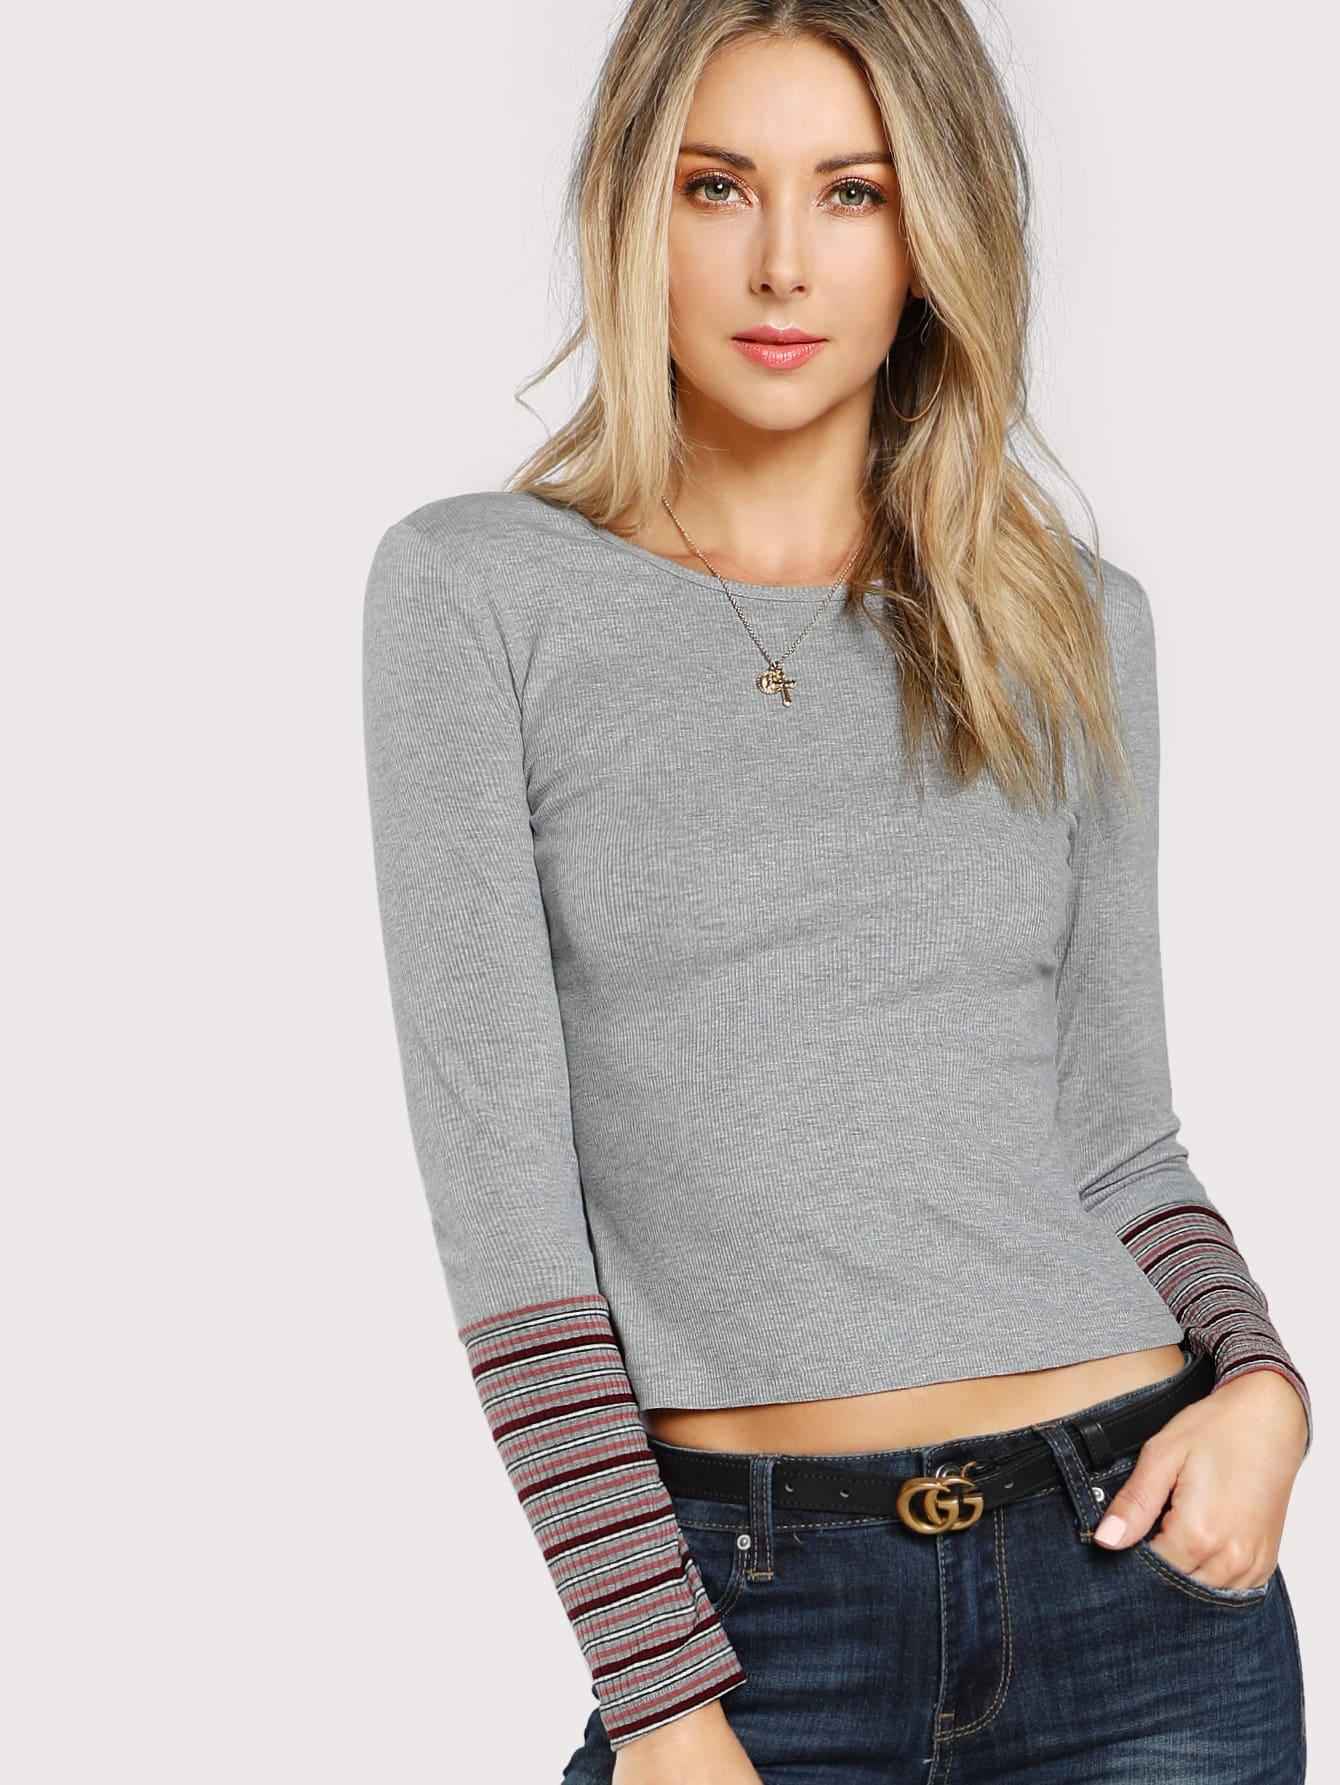 Striped Cuff Form Fit T Shirt Emmacloth Women Fast Fashion